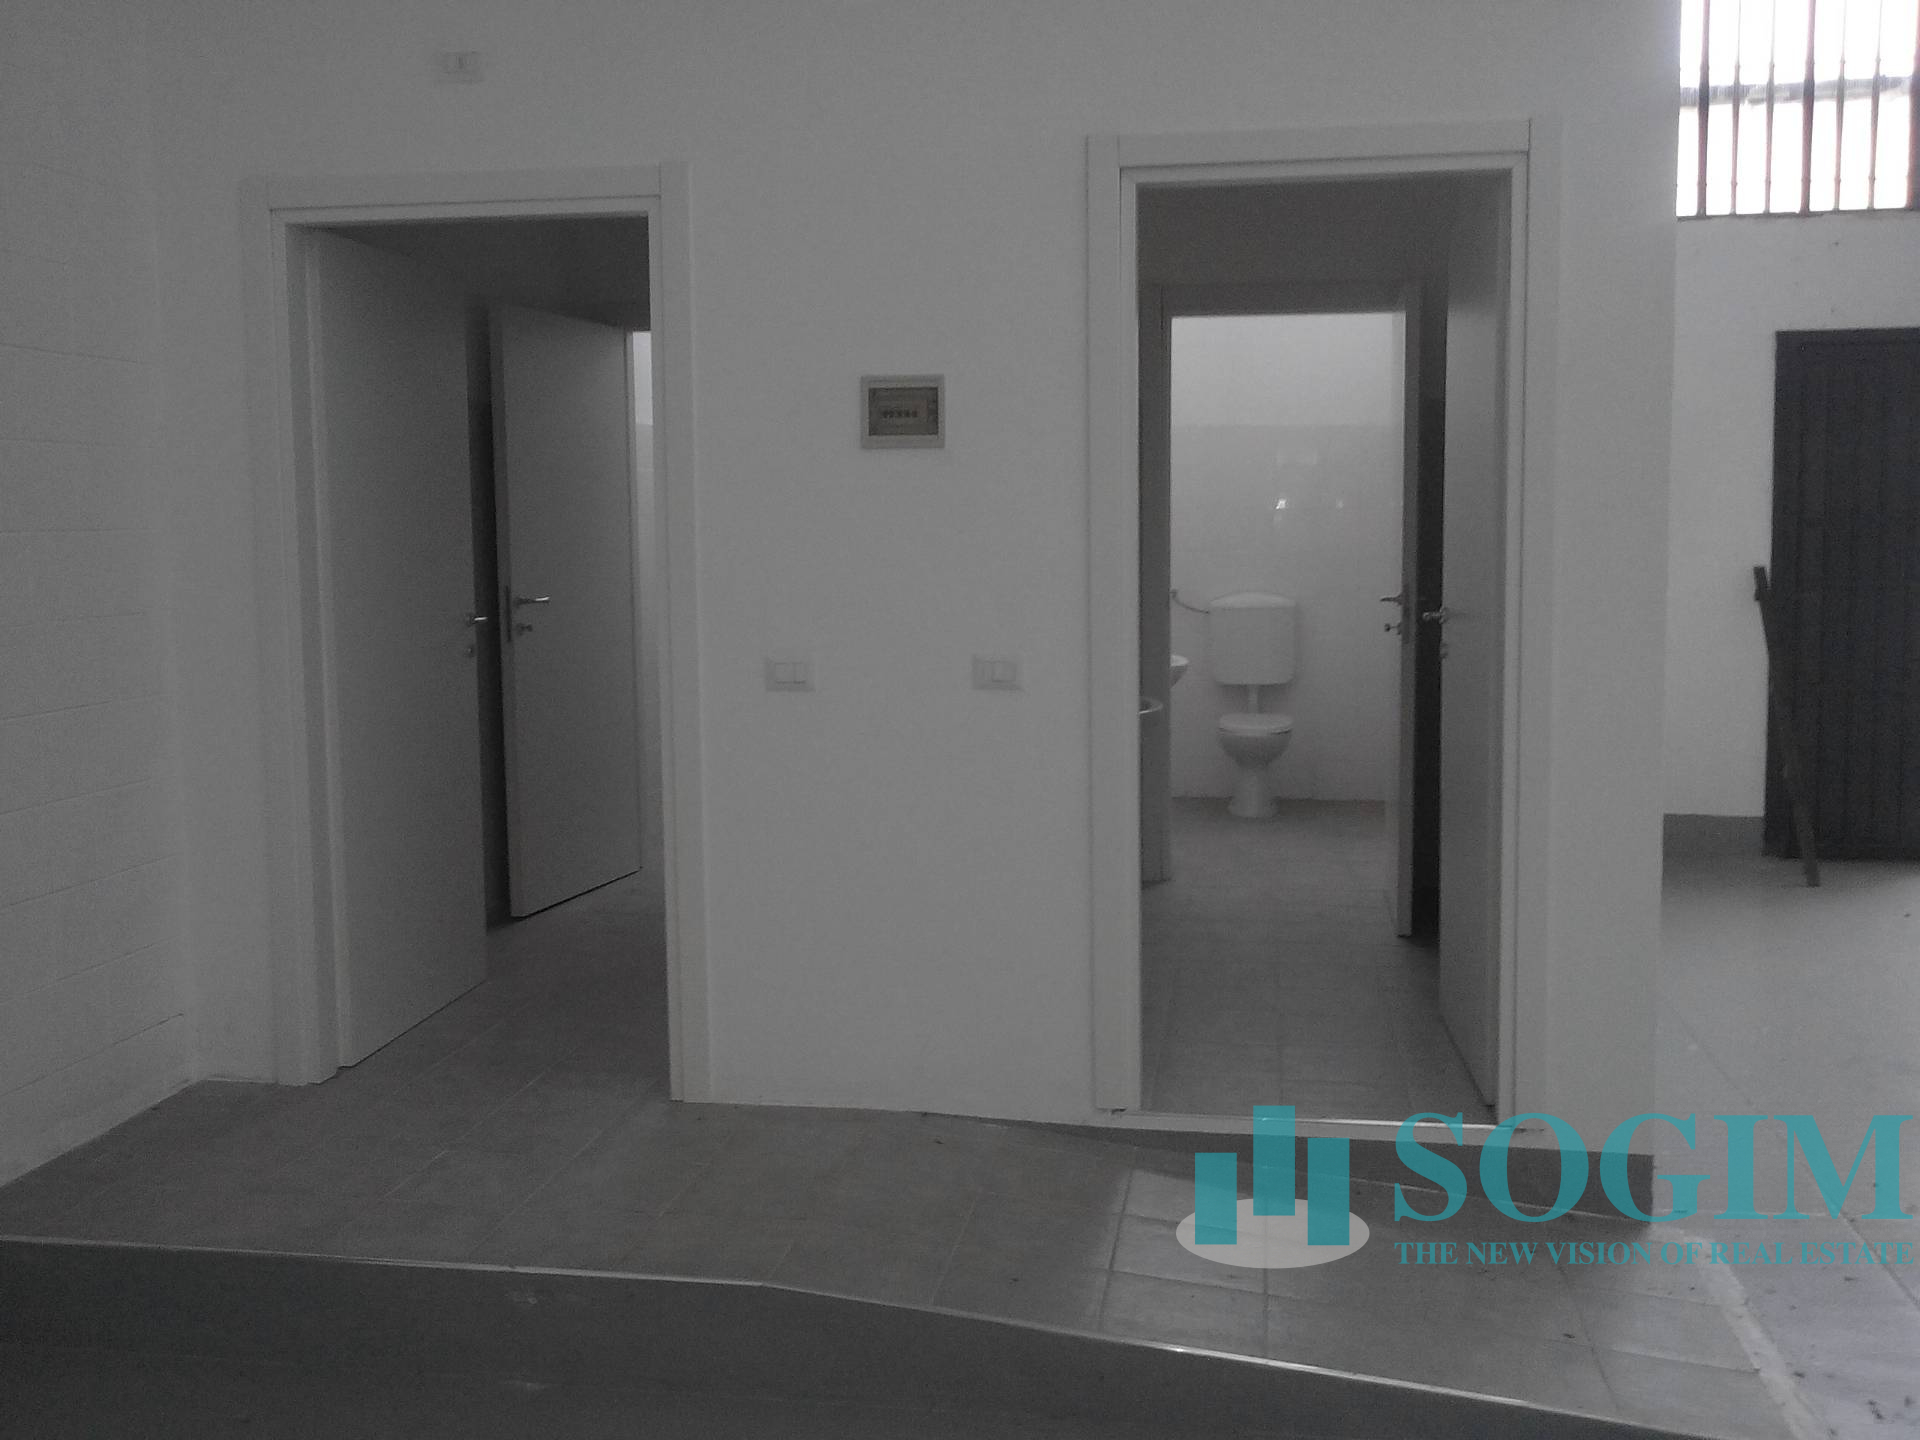 Immobile Commerciale in Affitto a Gaggiano  rif. 9303